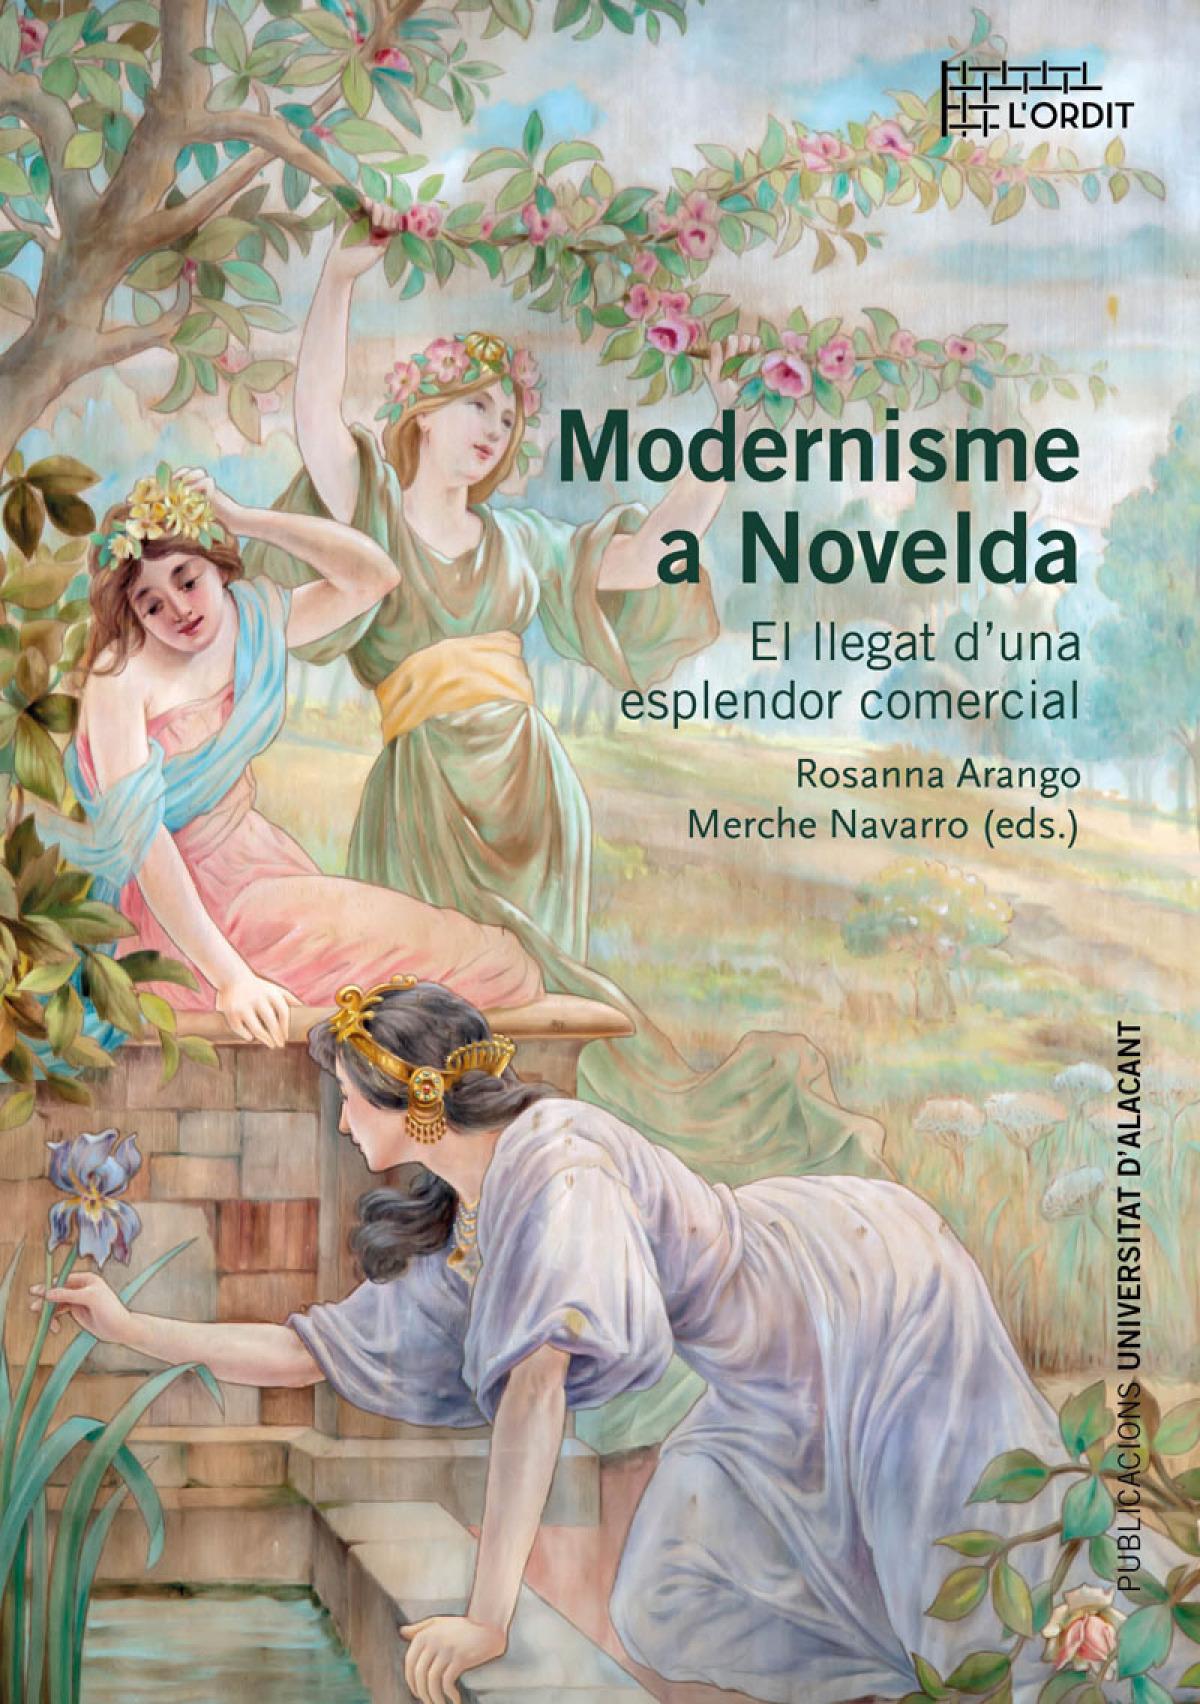 Modernisme a Novelda